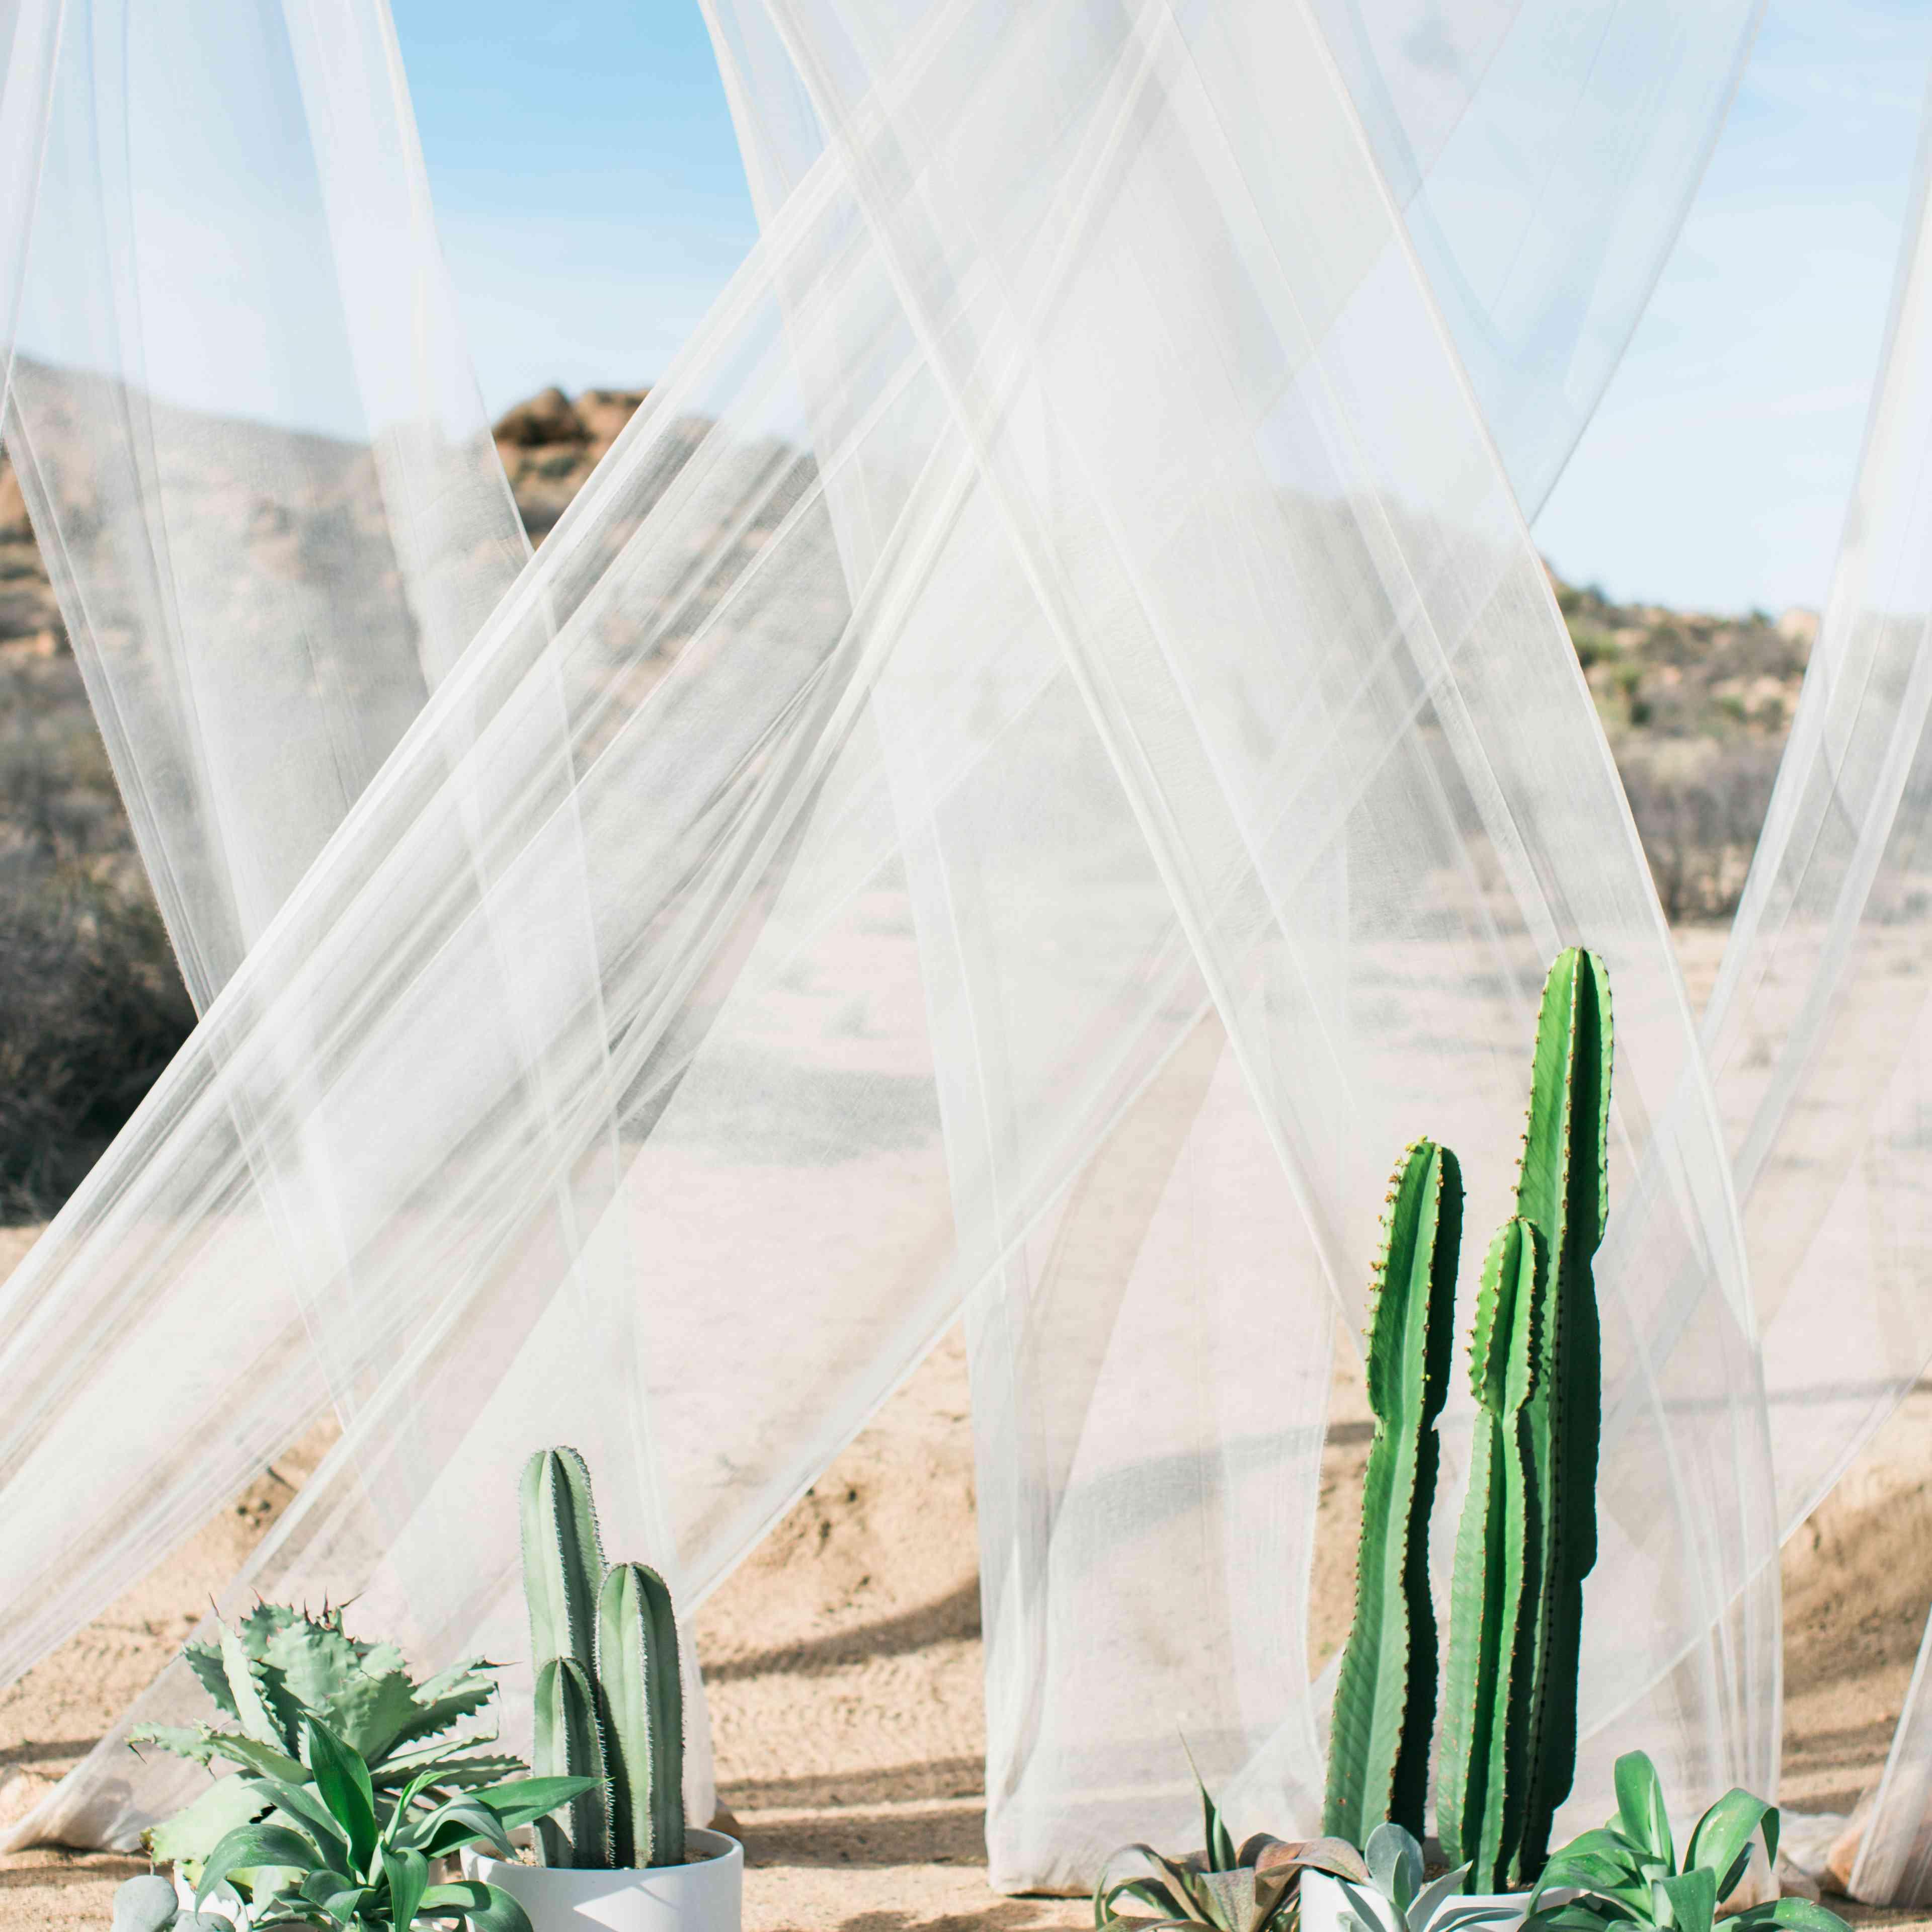 Cactus-Decorated Ceremony Backdrop